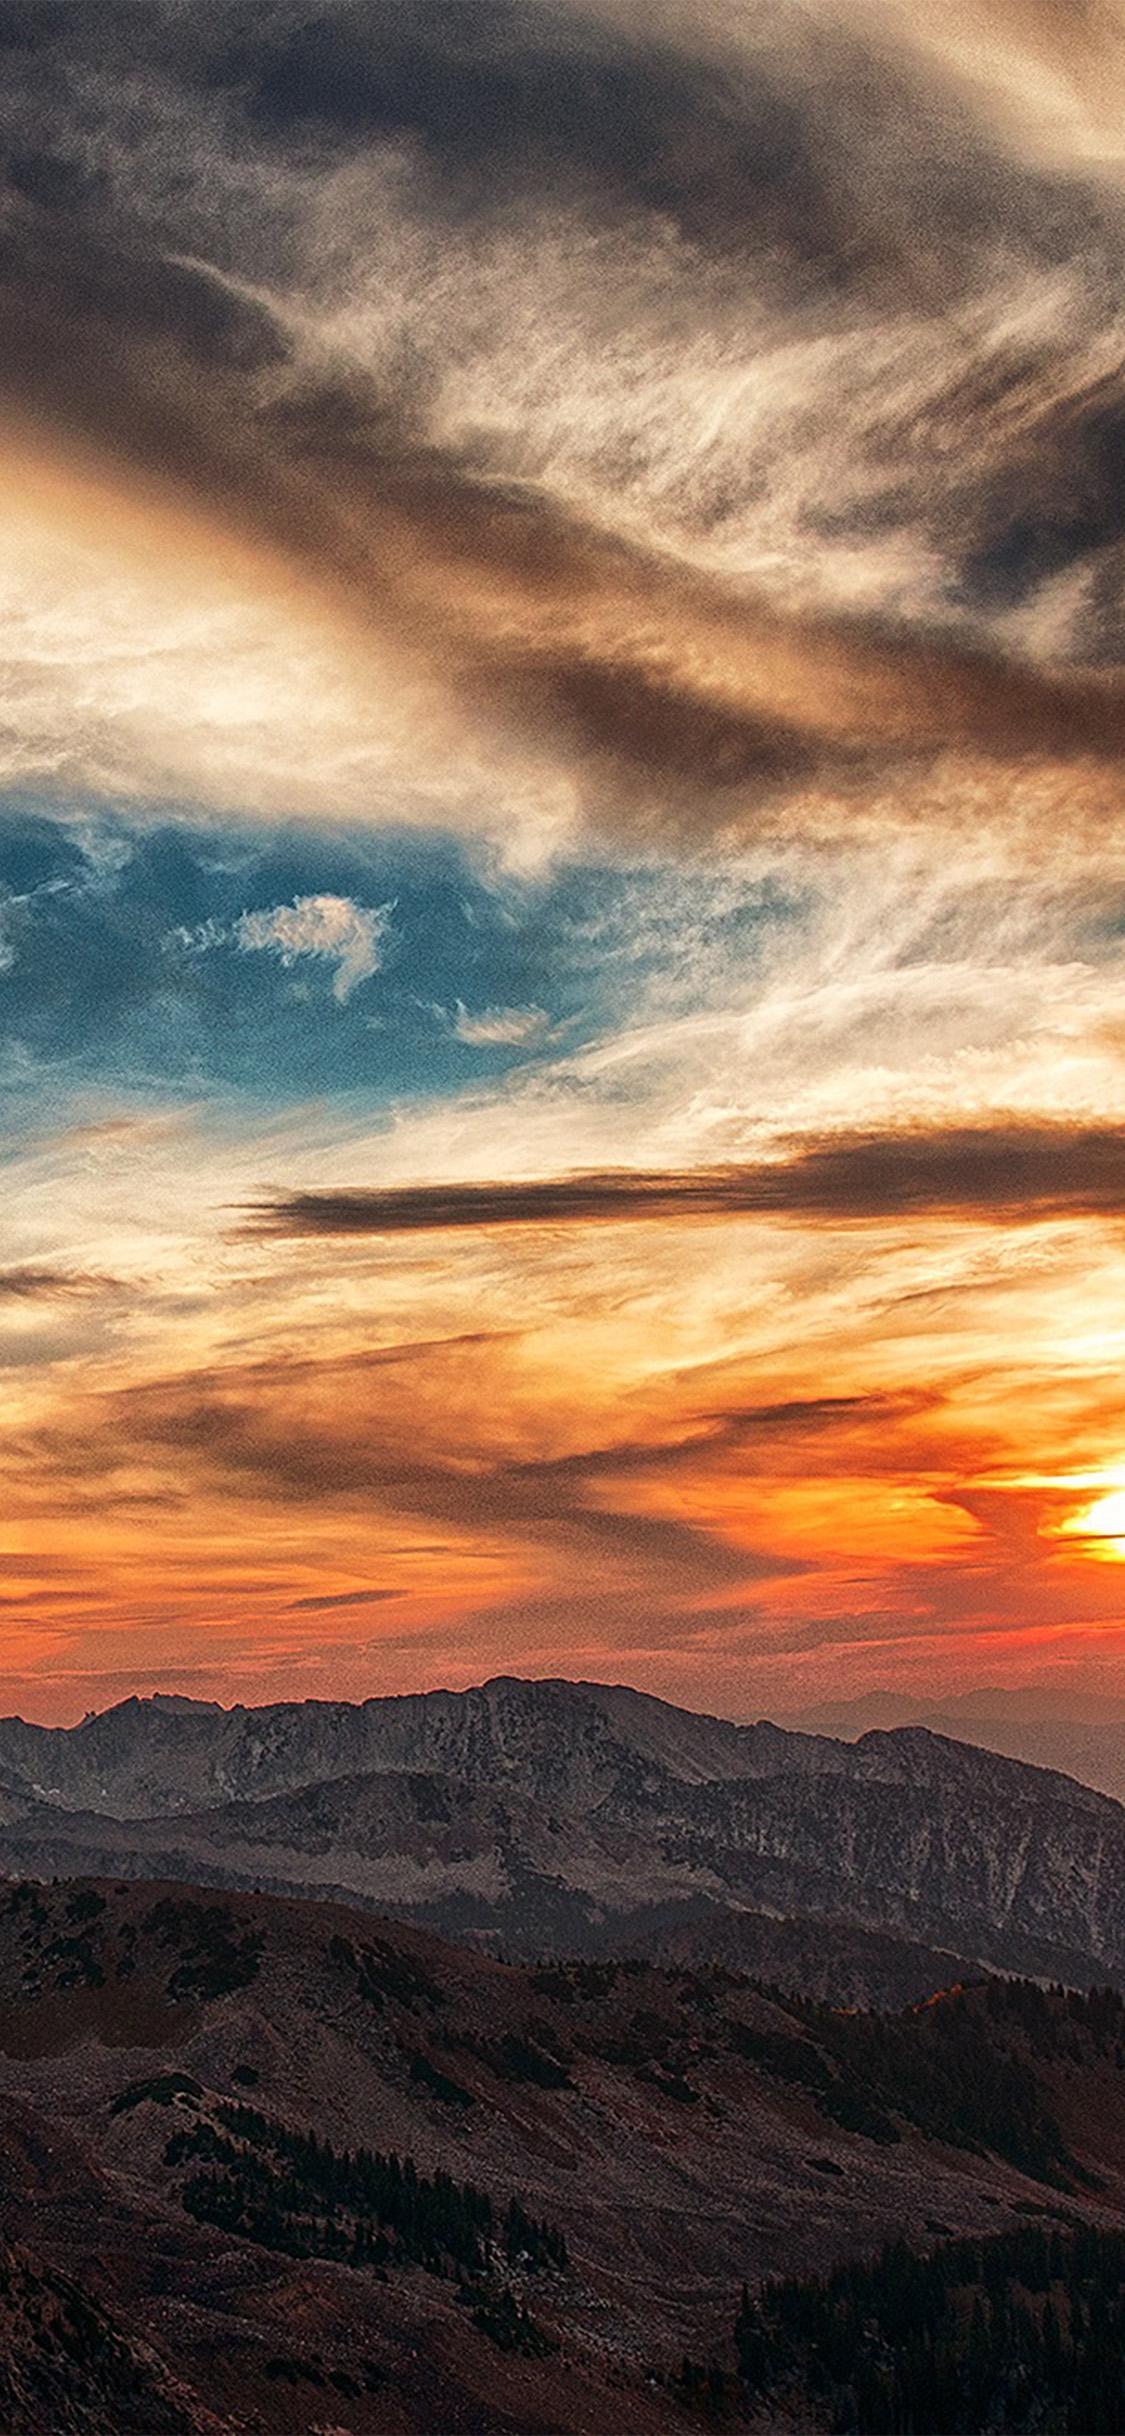 Beautiful Iphone 5 Wallpapers Nv05 Sunset Mountain Sky Cloud Nature Wallpaper